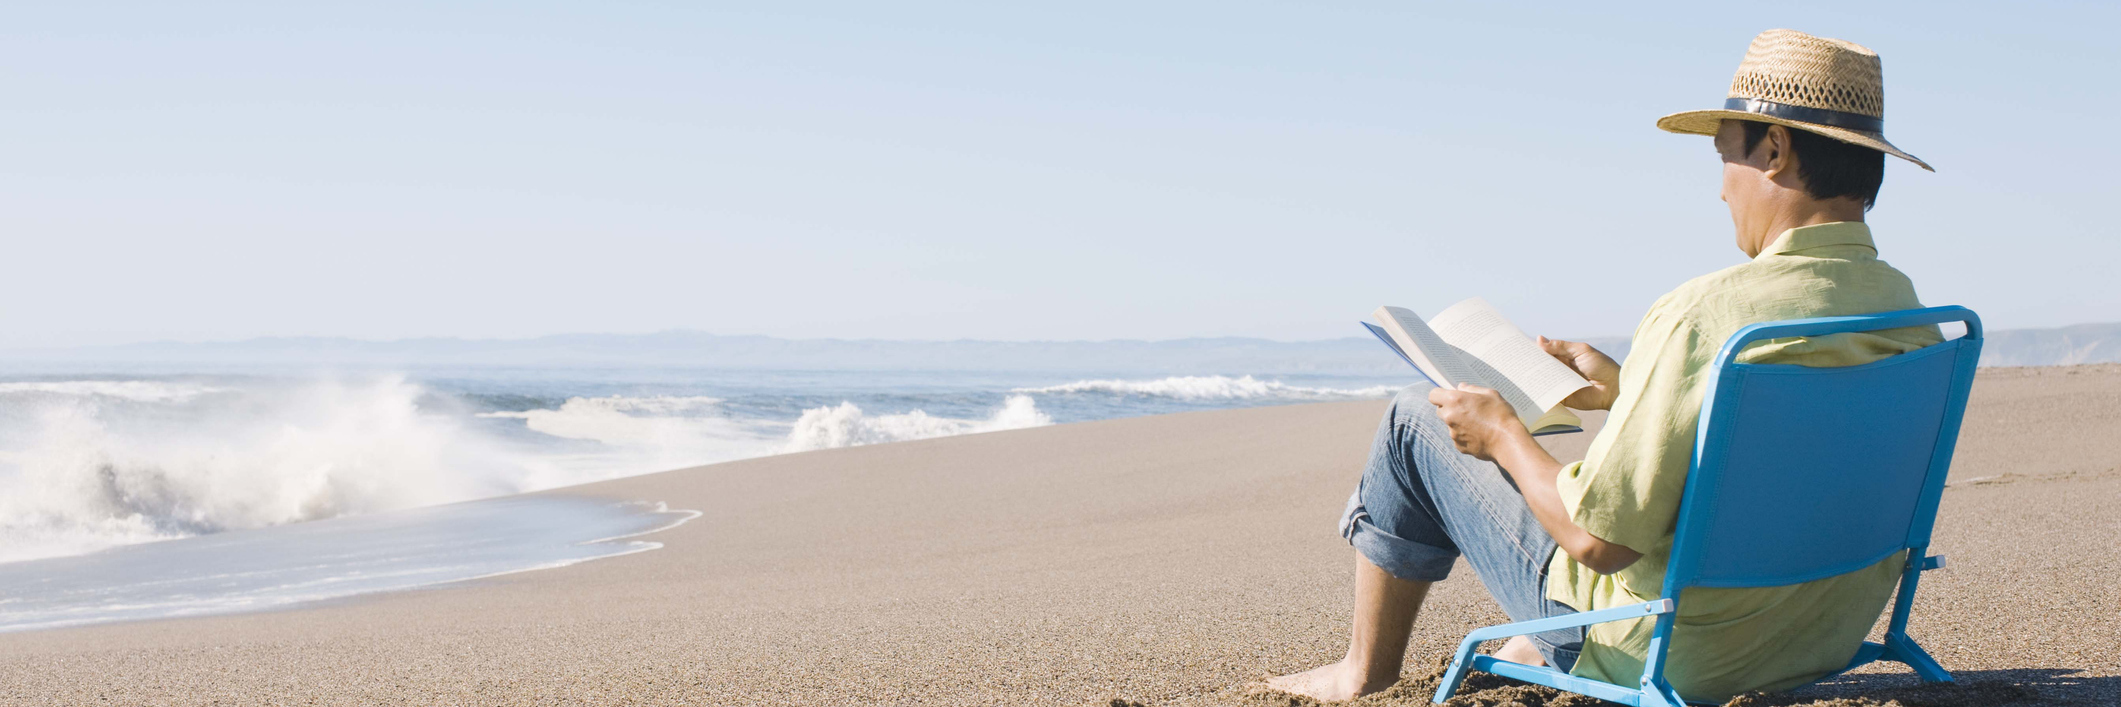 man reading a book on the beach